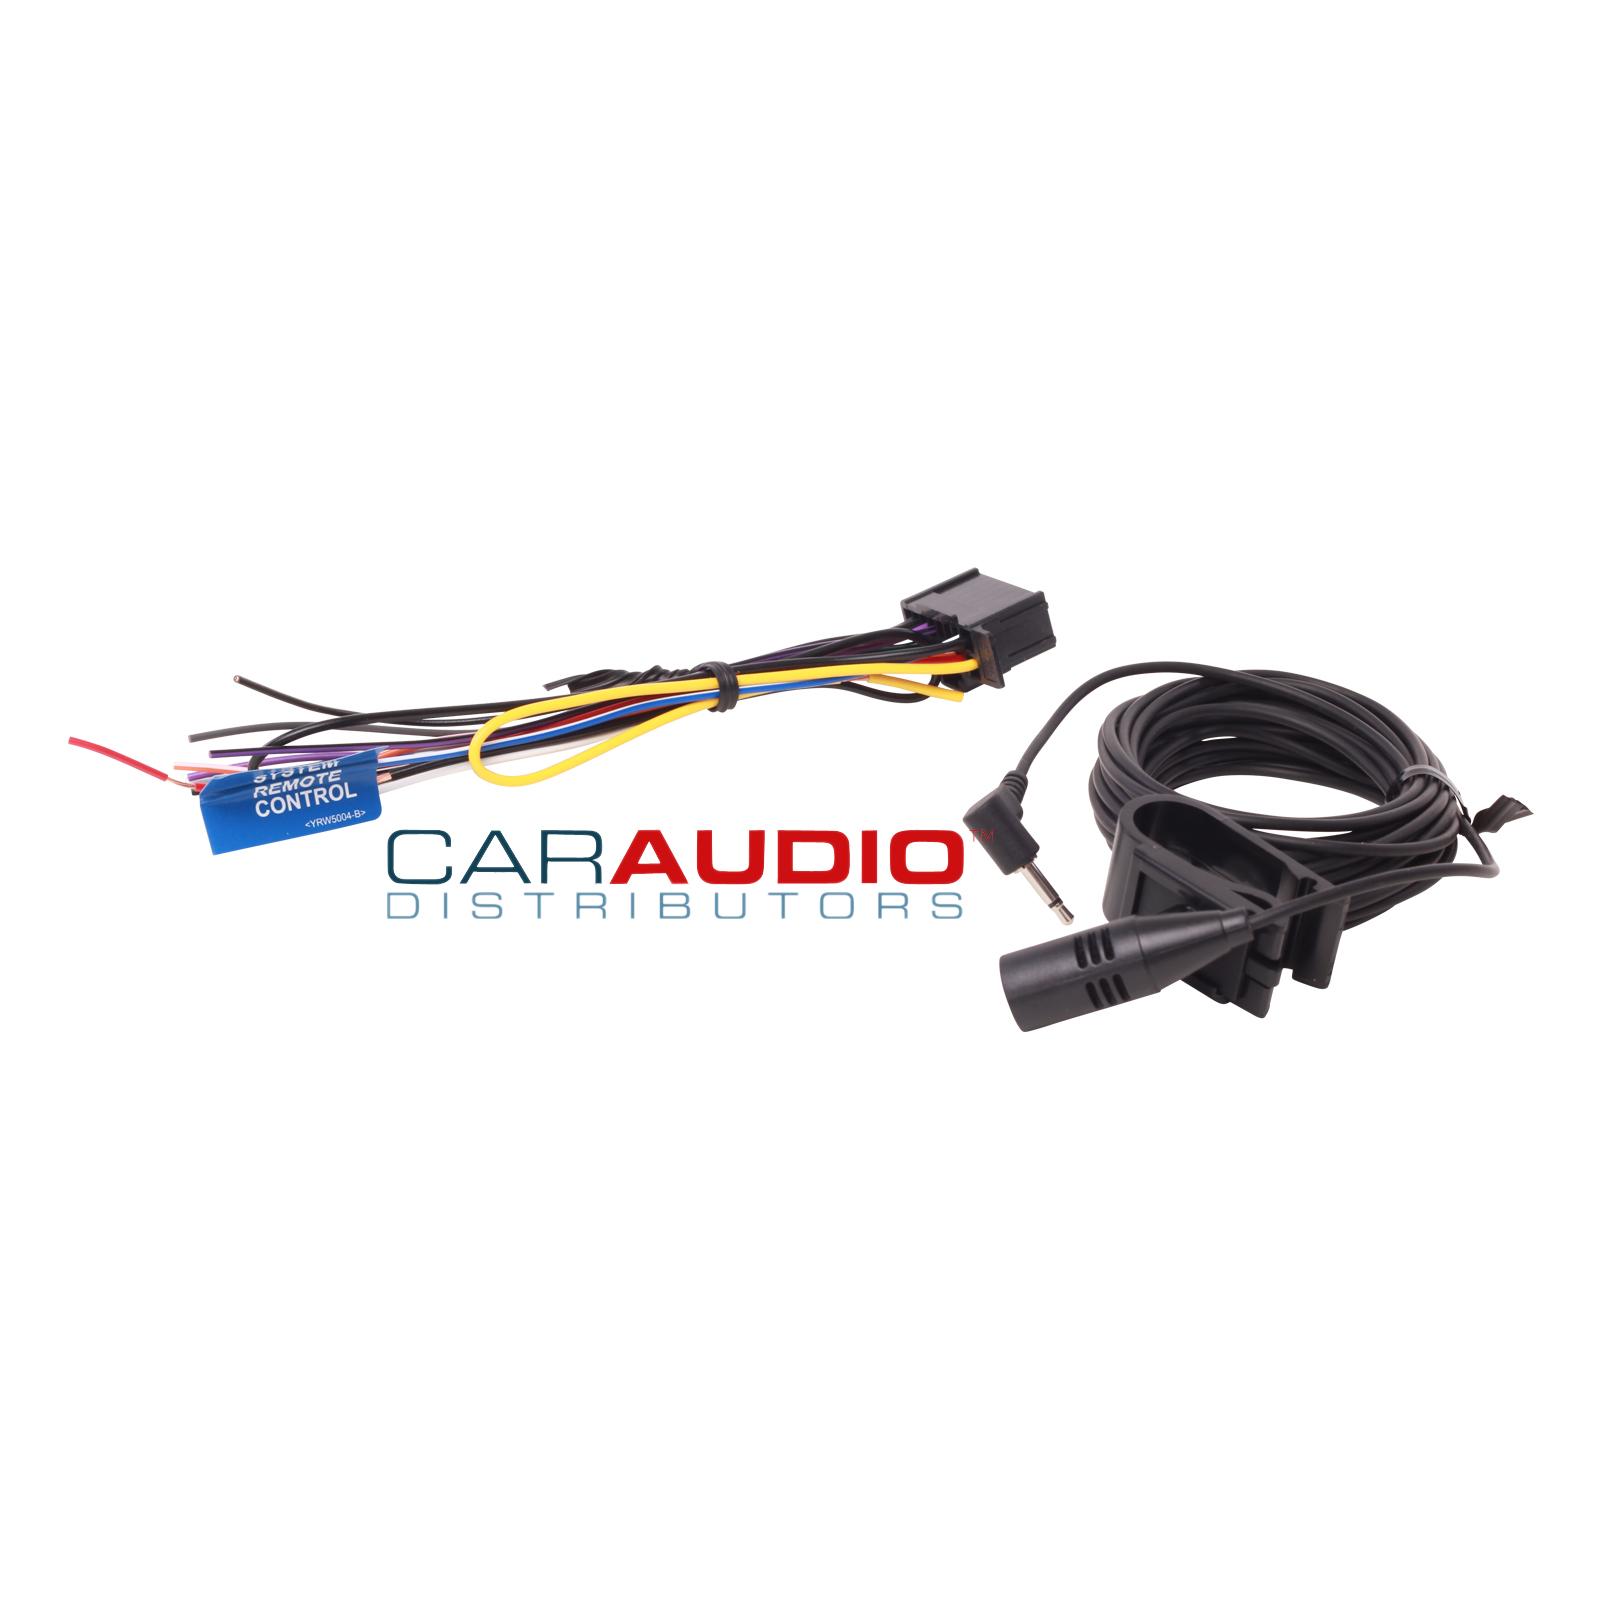 pioneer fh x720bt be nungsanleitung deutsch goodman air conditioning near me new in dash car stereo double din cd mp3